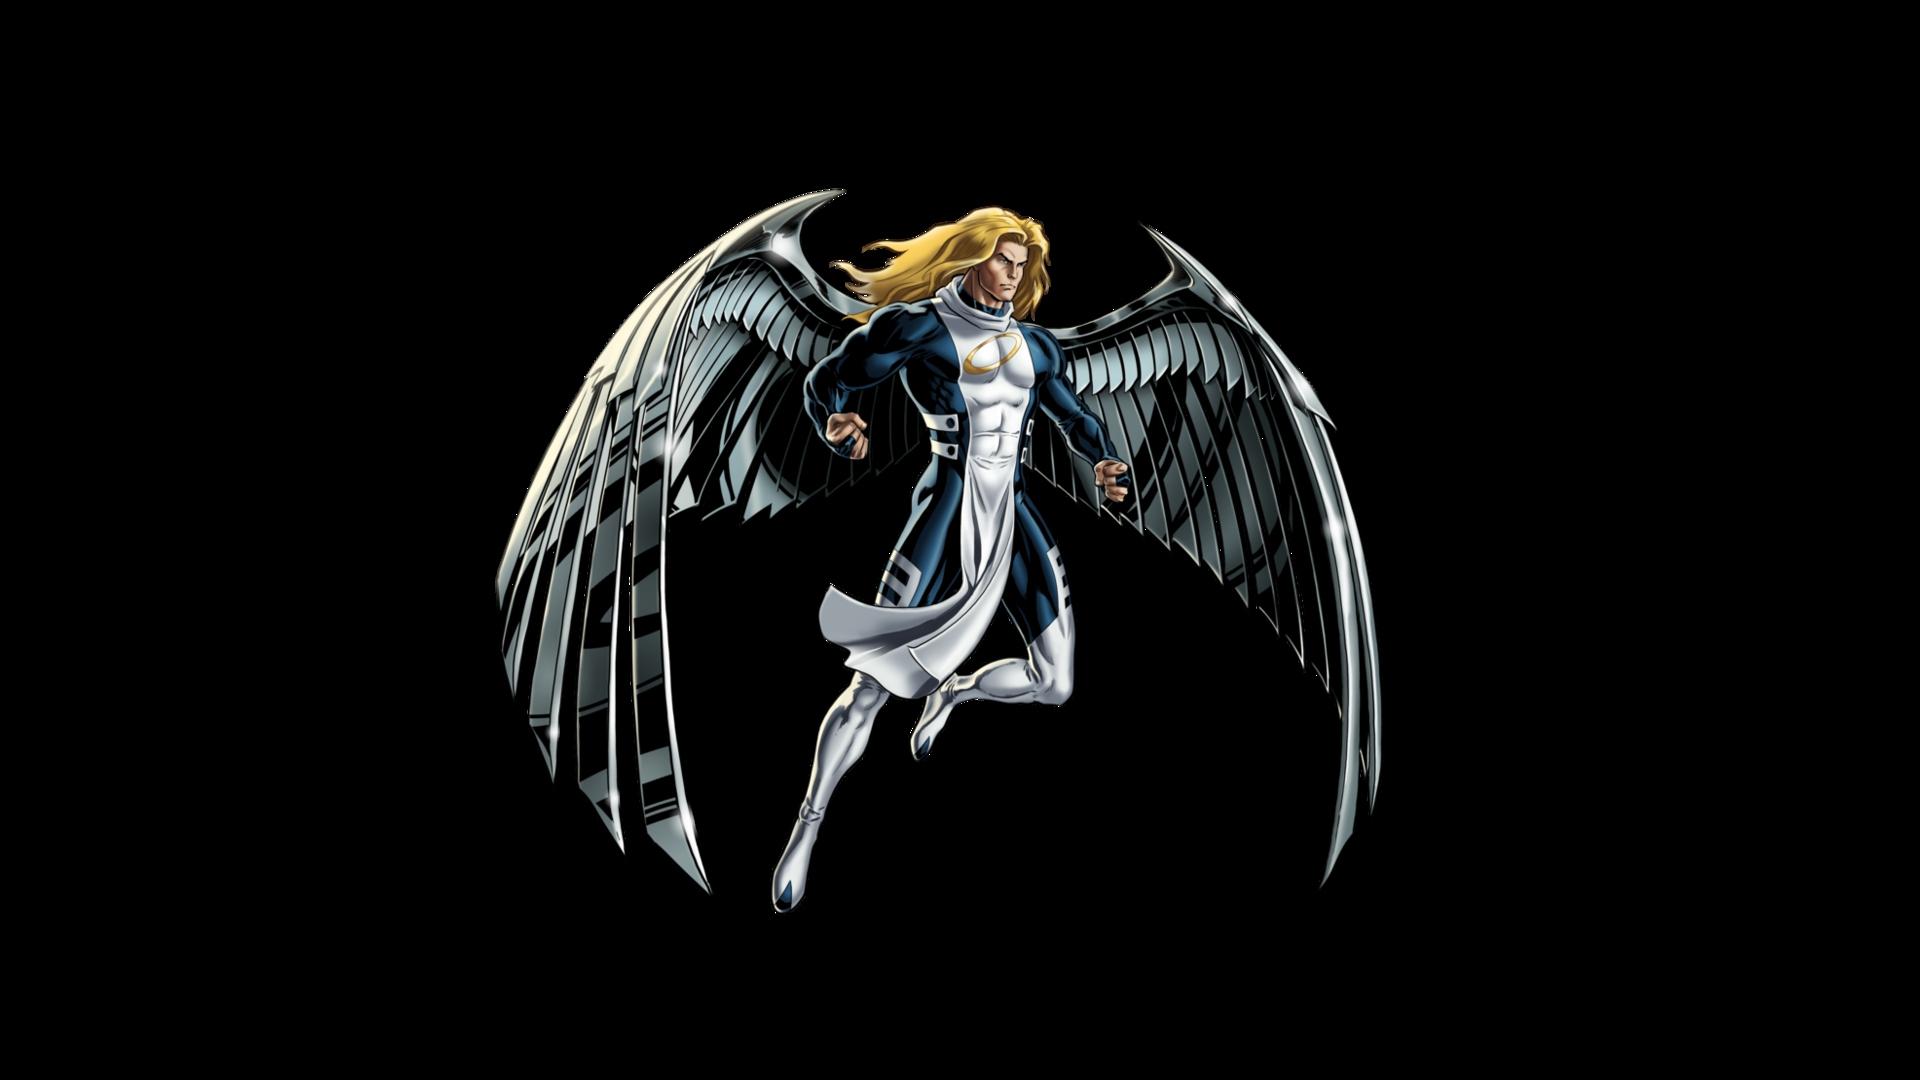 Must see Wallpaper Marvel Archangel - 478189  Graphic_93861.jpg